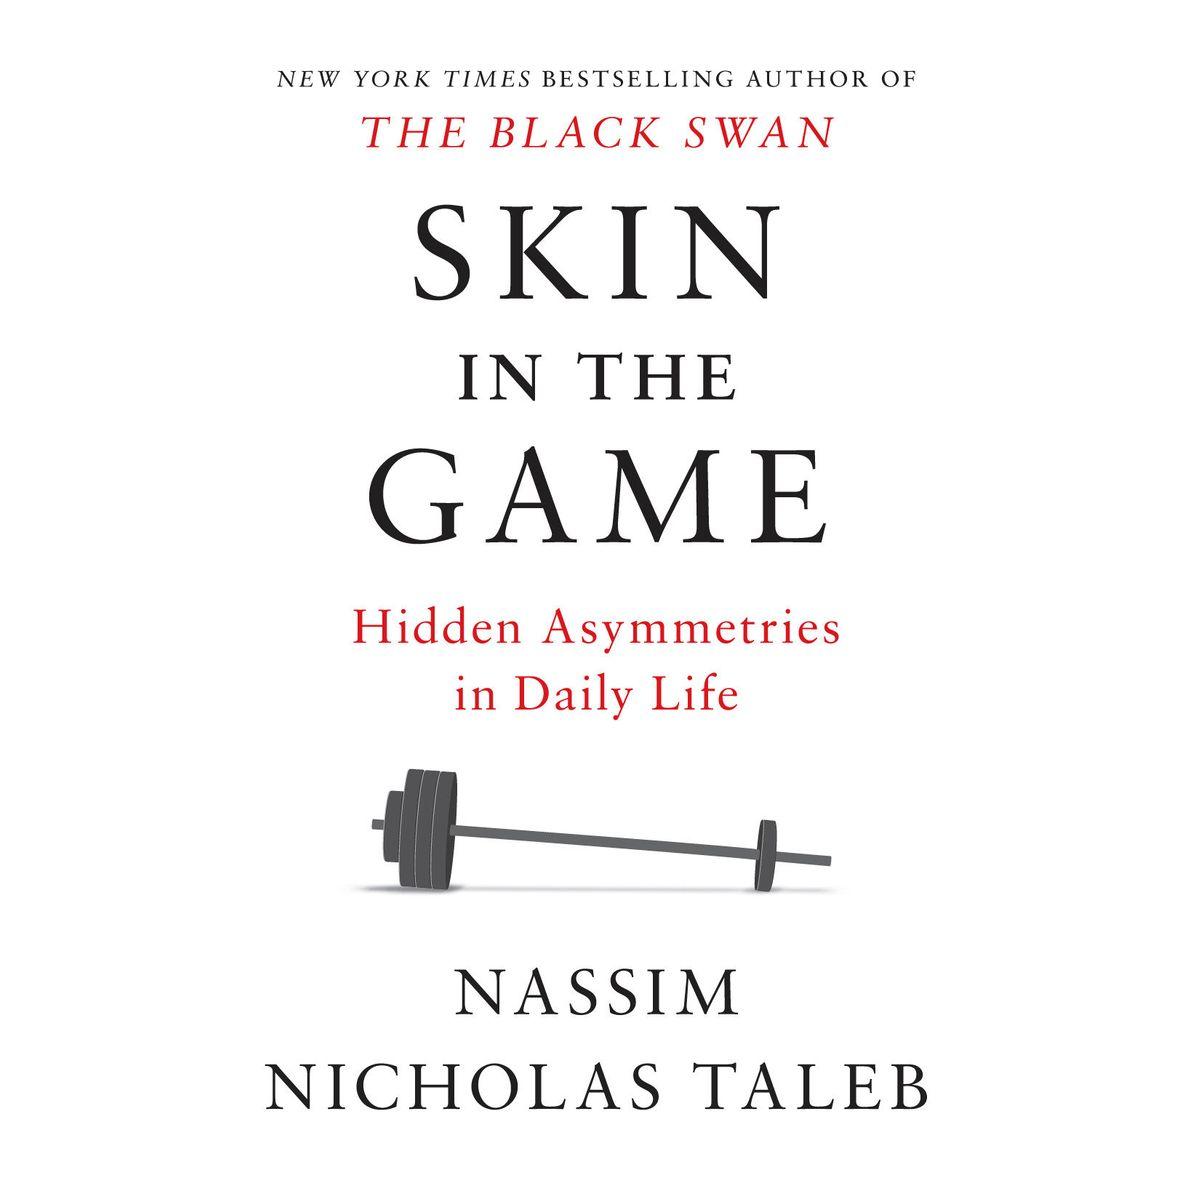 Cover image of Nassim Nicholas Taleb's 'Skin in the Game'